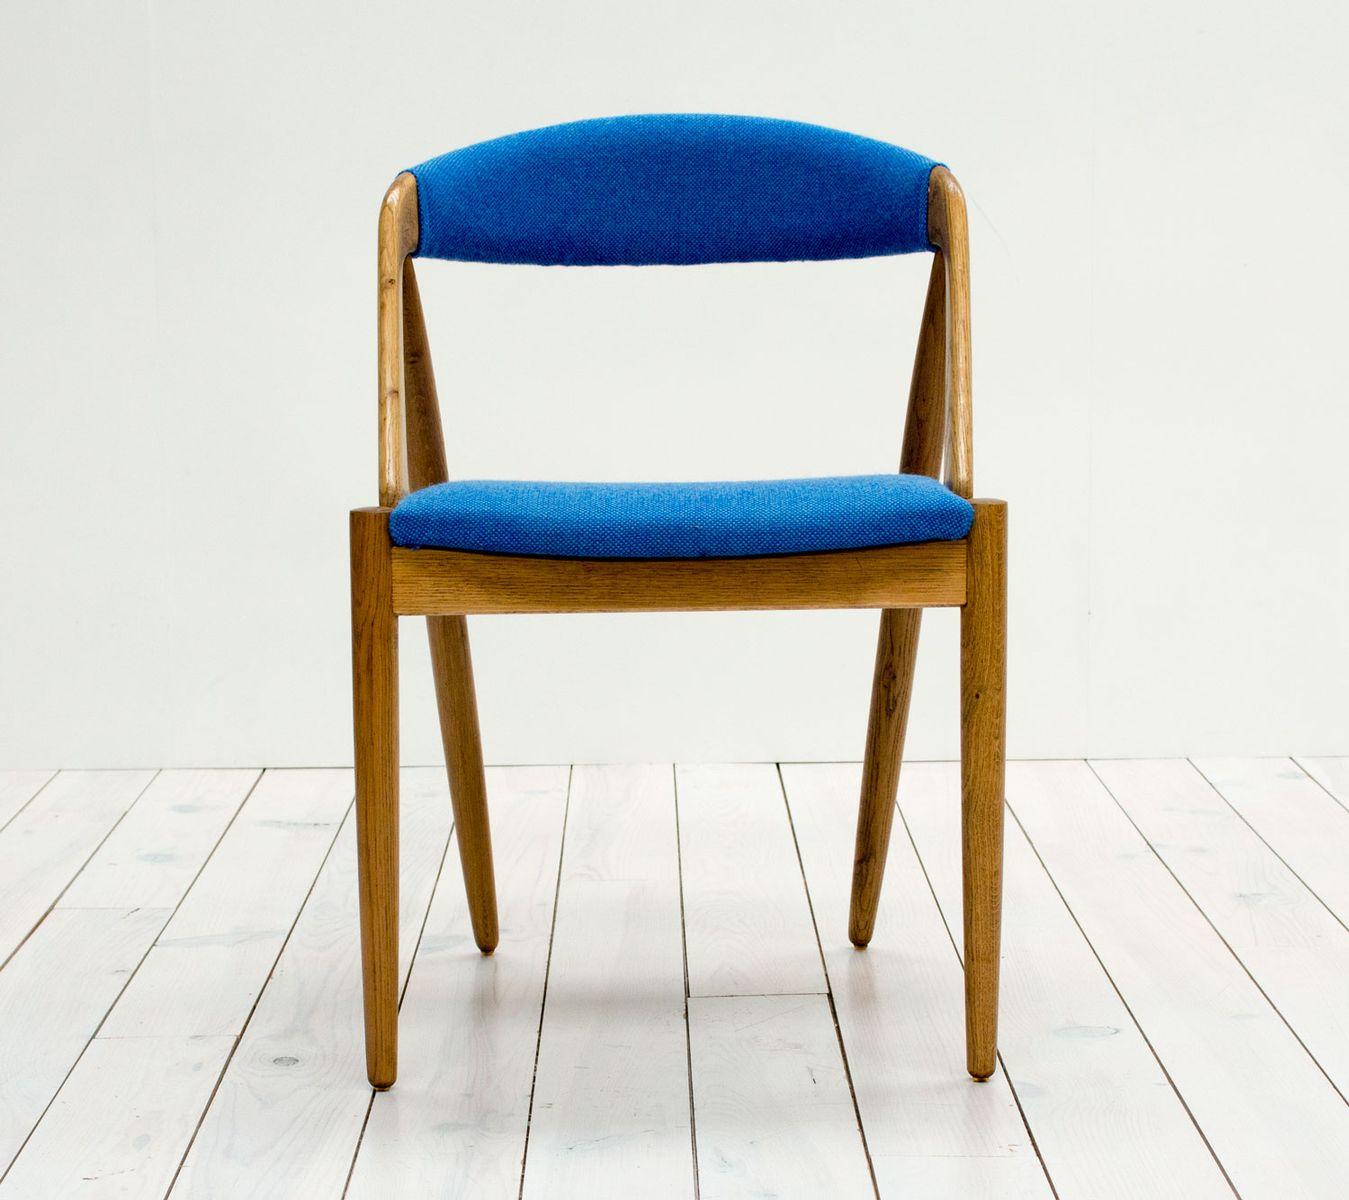 Vintage 31 chair in oak by kai kristiansen for schou andersen for sale at pamono - Kai kristiansen chair ...